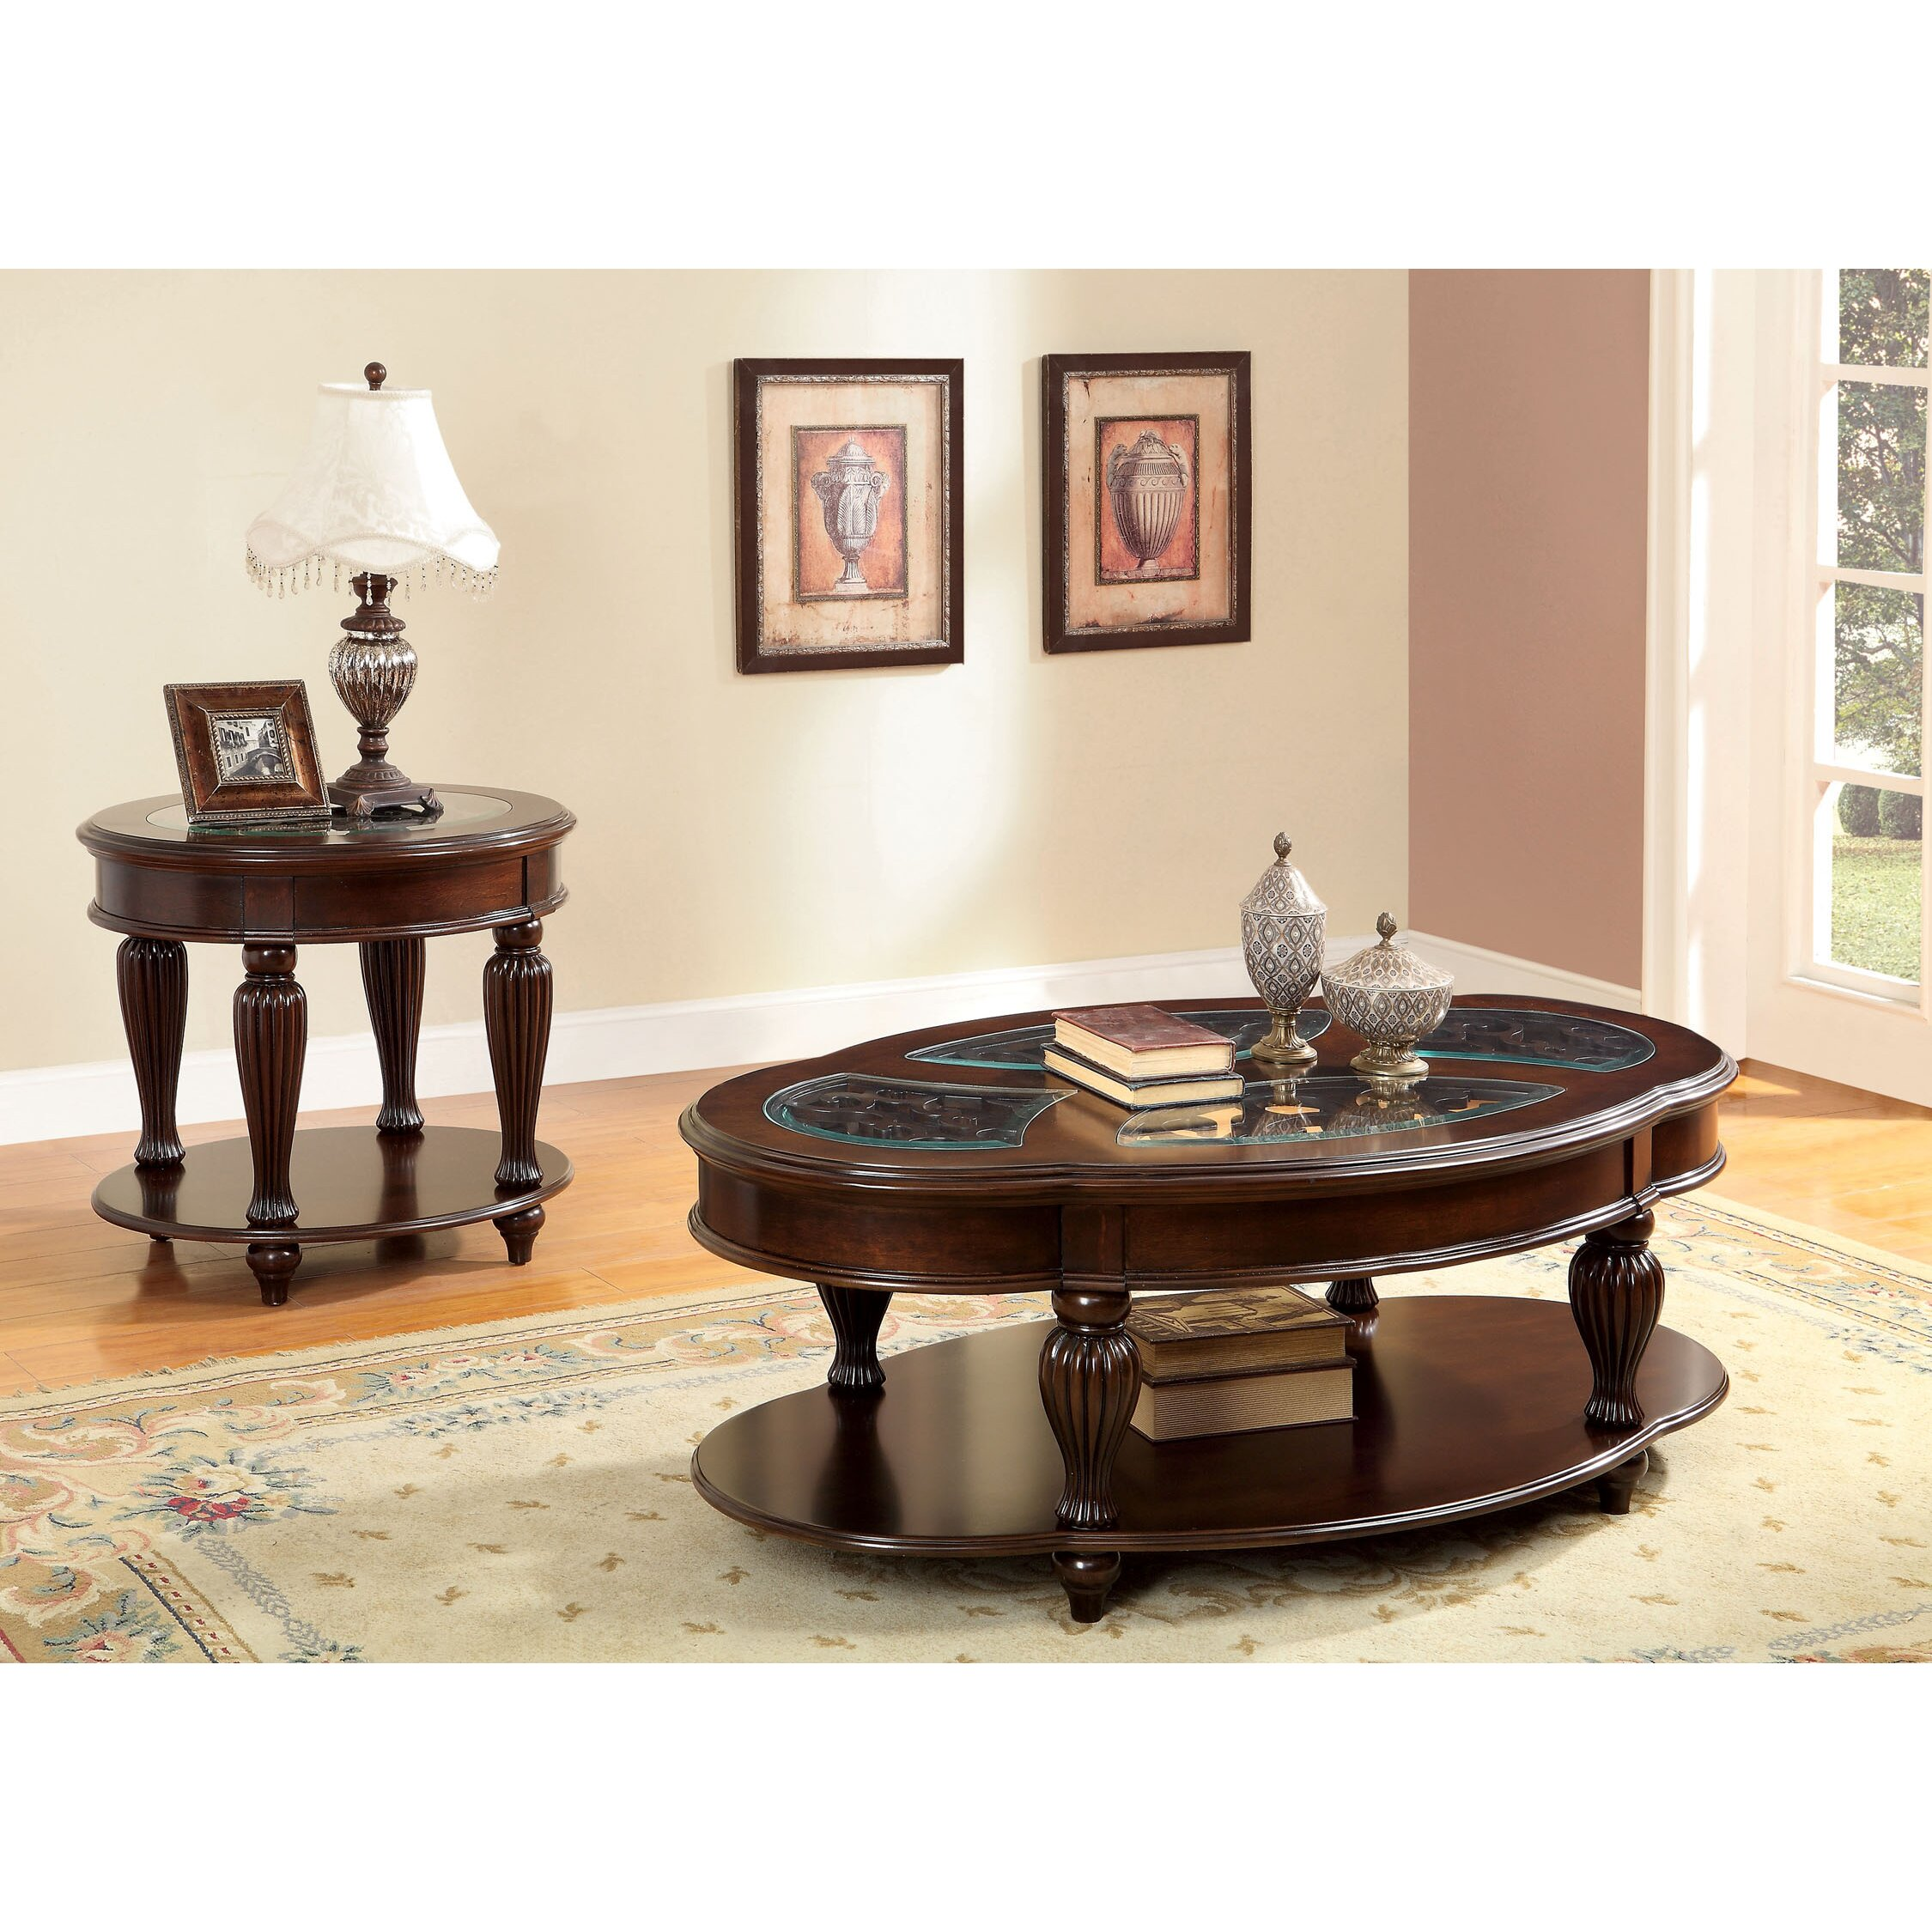 Astoria Grand Rhuddlan Coffee Table Set & Reviews